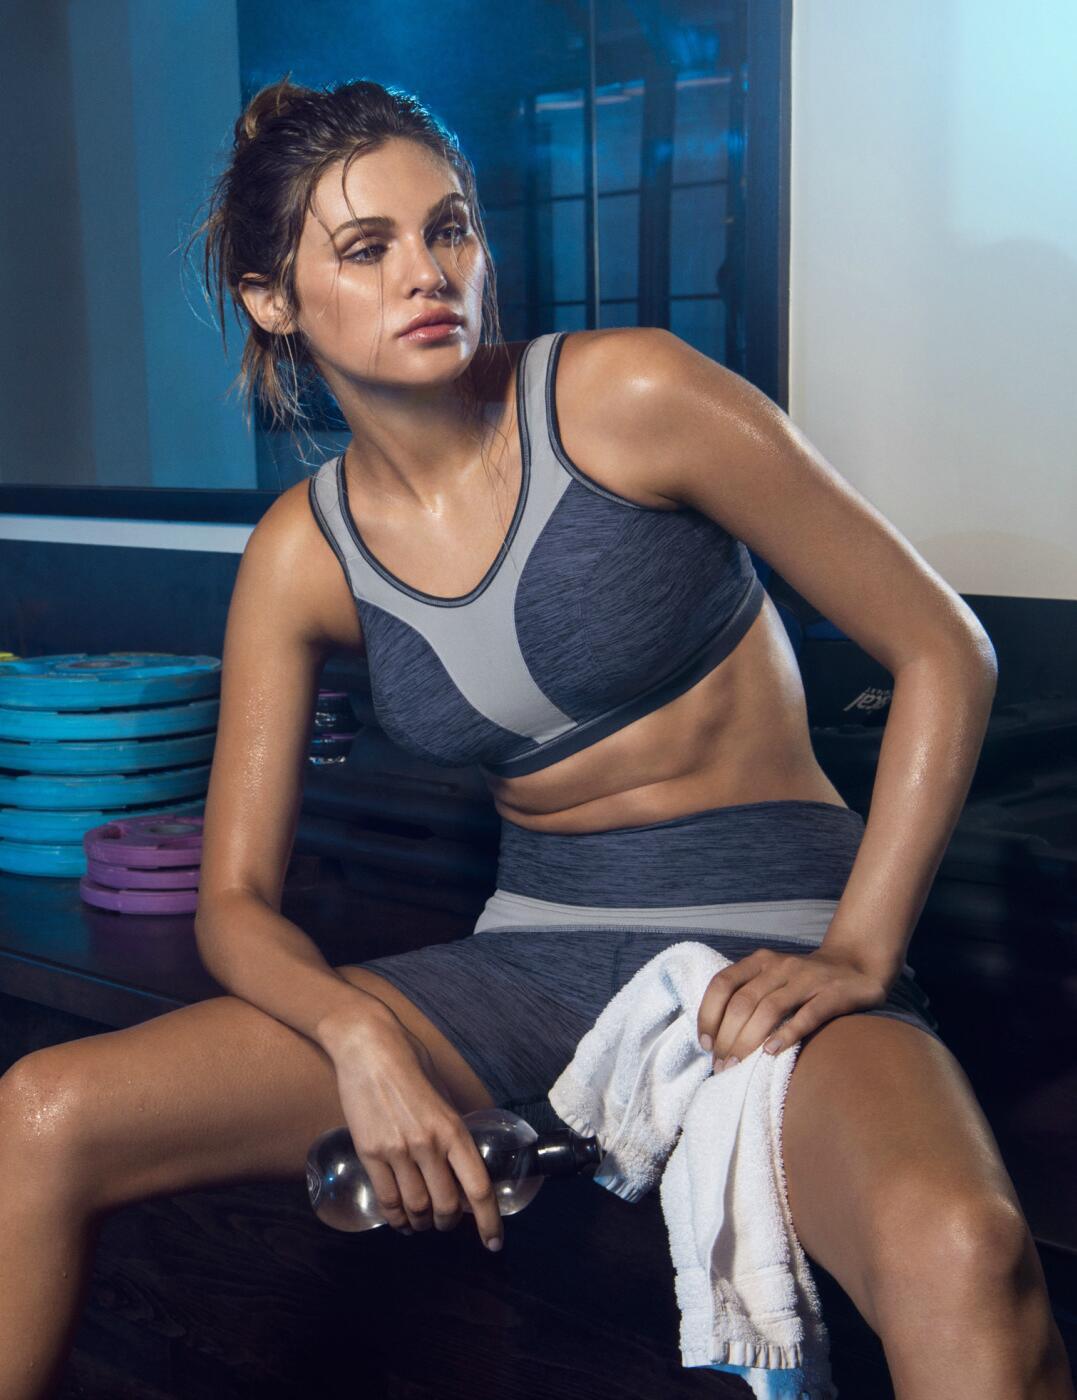 Freya-Active-Force-Sports-Bra-4000-High-Impact-Non-Wired-Womens-Gym-Bras miniatura 17